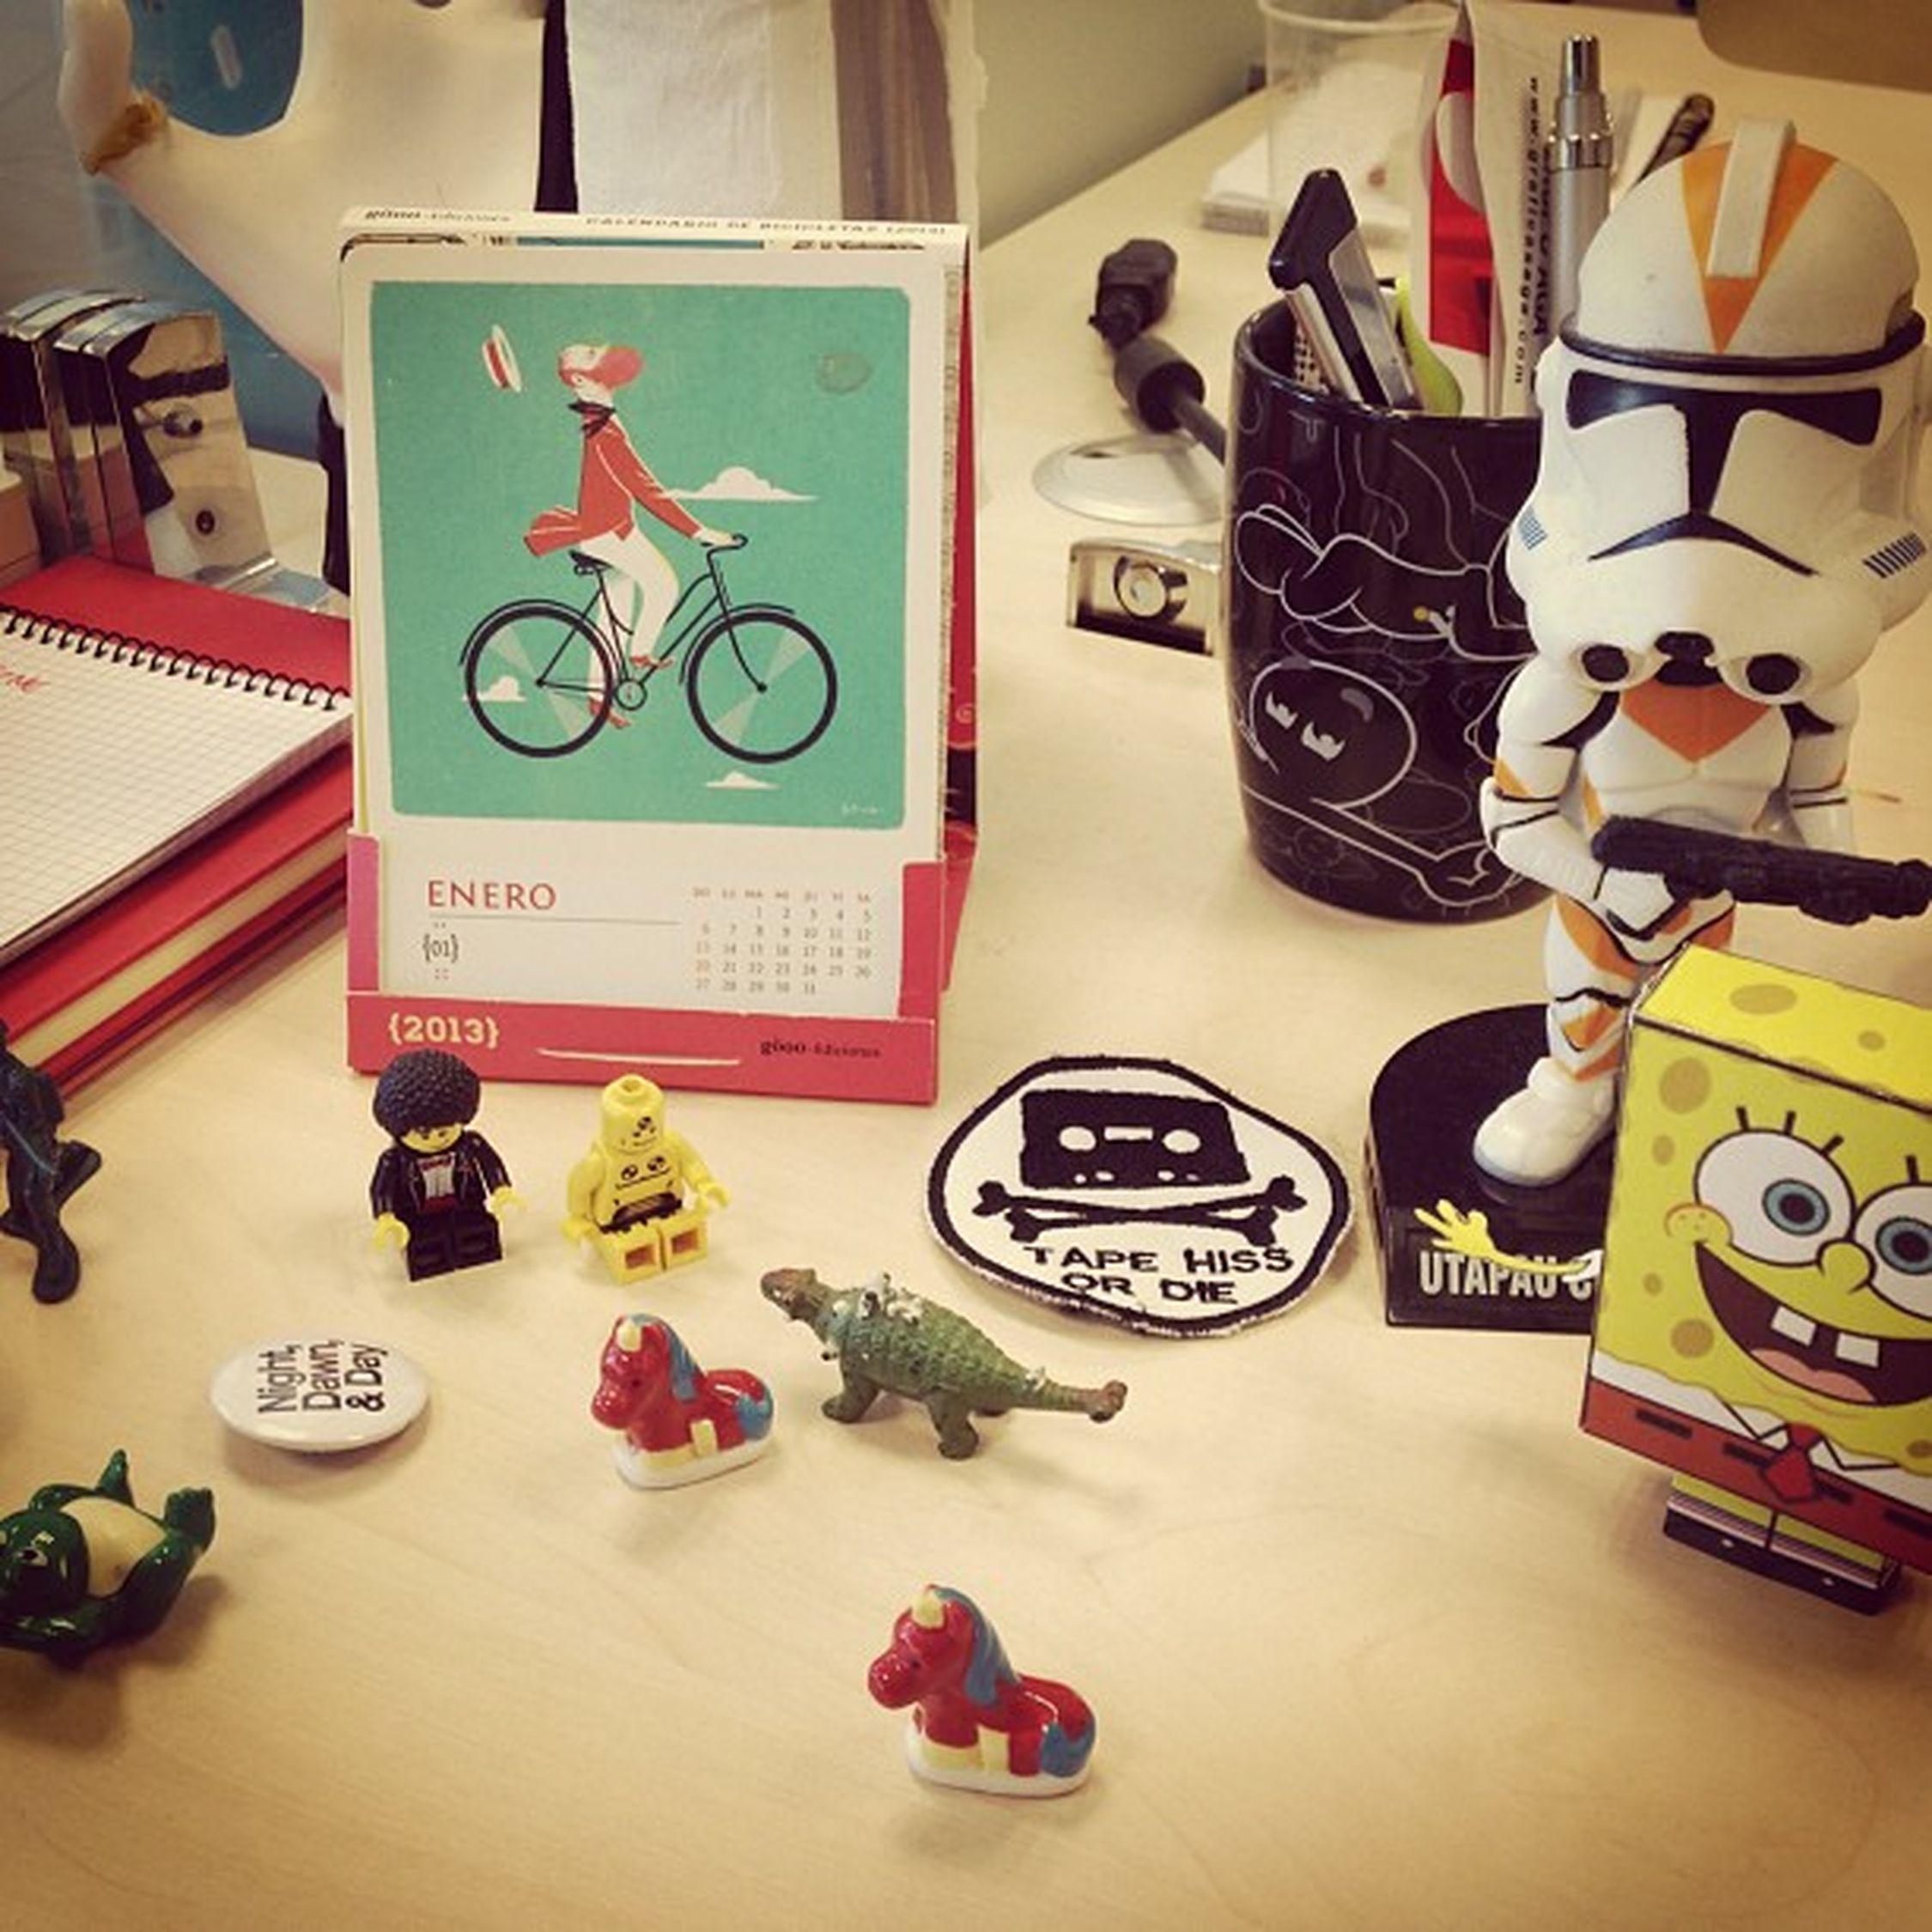 Everyday friends #friends #toys #toy #work #juguetes #trabajo #desktop #escritorio #cheil #madrid #igscout #_wg #instapic #instagramer #insta_crew #instamillion #tagstagramers #instago #tagsforlikes #photooftheday #instagroove #igersmadrid #picoftheday #i Igersmadrid Instago Work Insta_crew Friends Igscout Desktop Tagsforlikes Toys Instagramer Toy _wg Instagroove Trabajo Instapic Madrid Instamillion Tagstagramers Photooftheday Juguetes Iphonesia Picoftheday Escritório Cheil Latergram